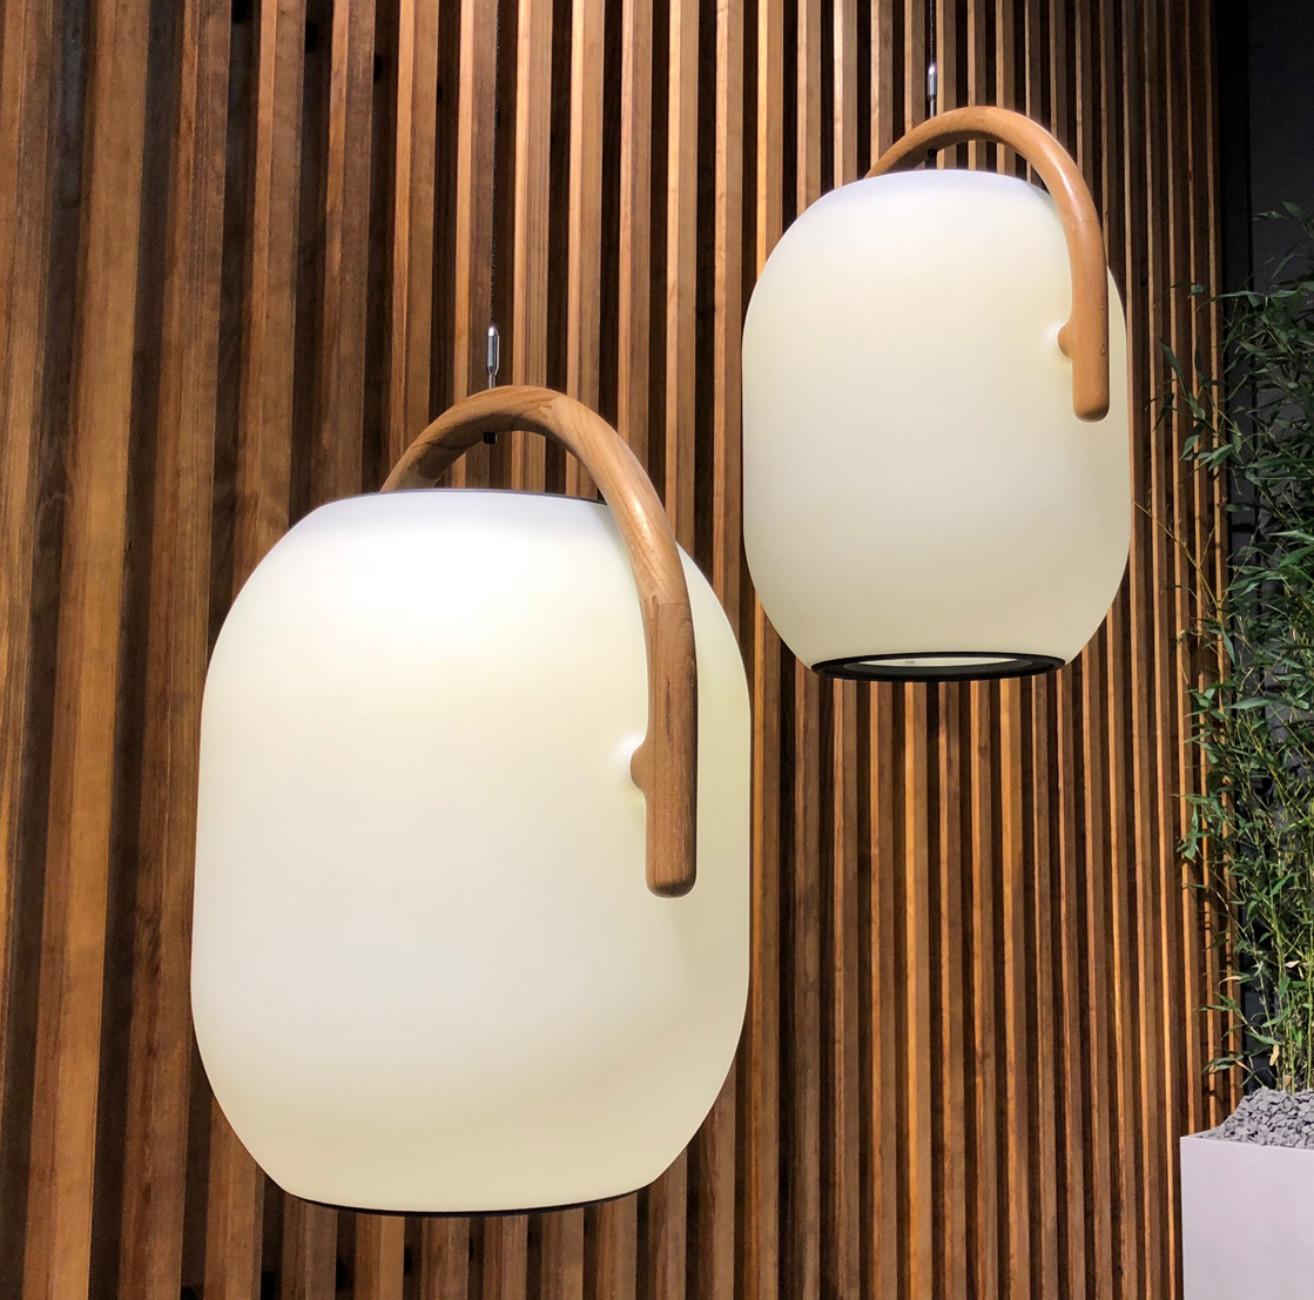 Review Of The Fair Light Building 2018 In Frankfurt Main Stylepark